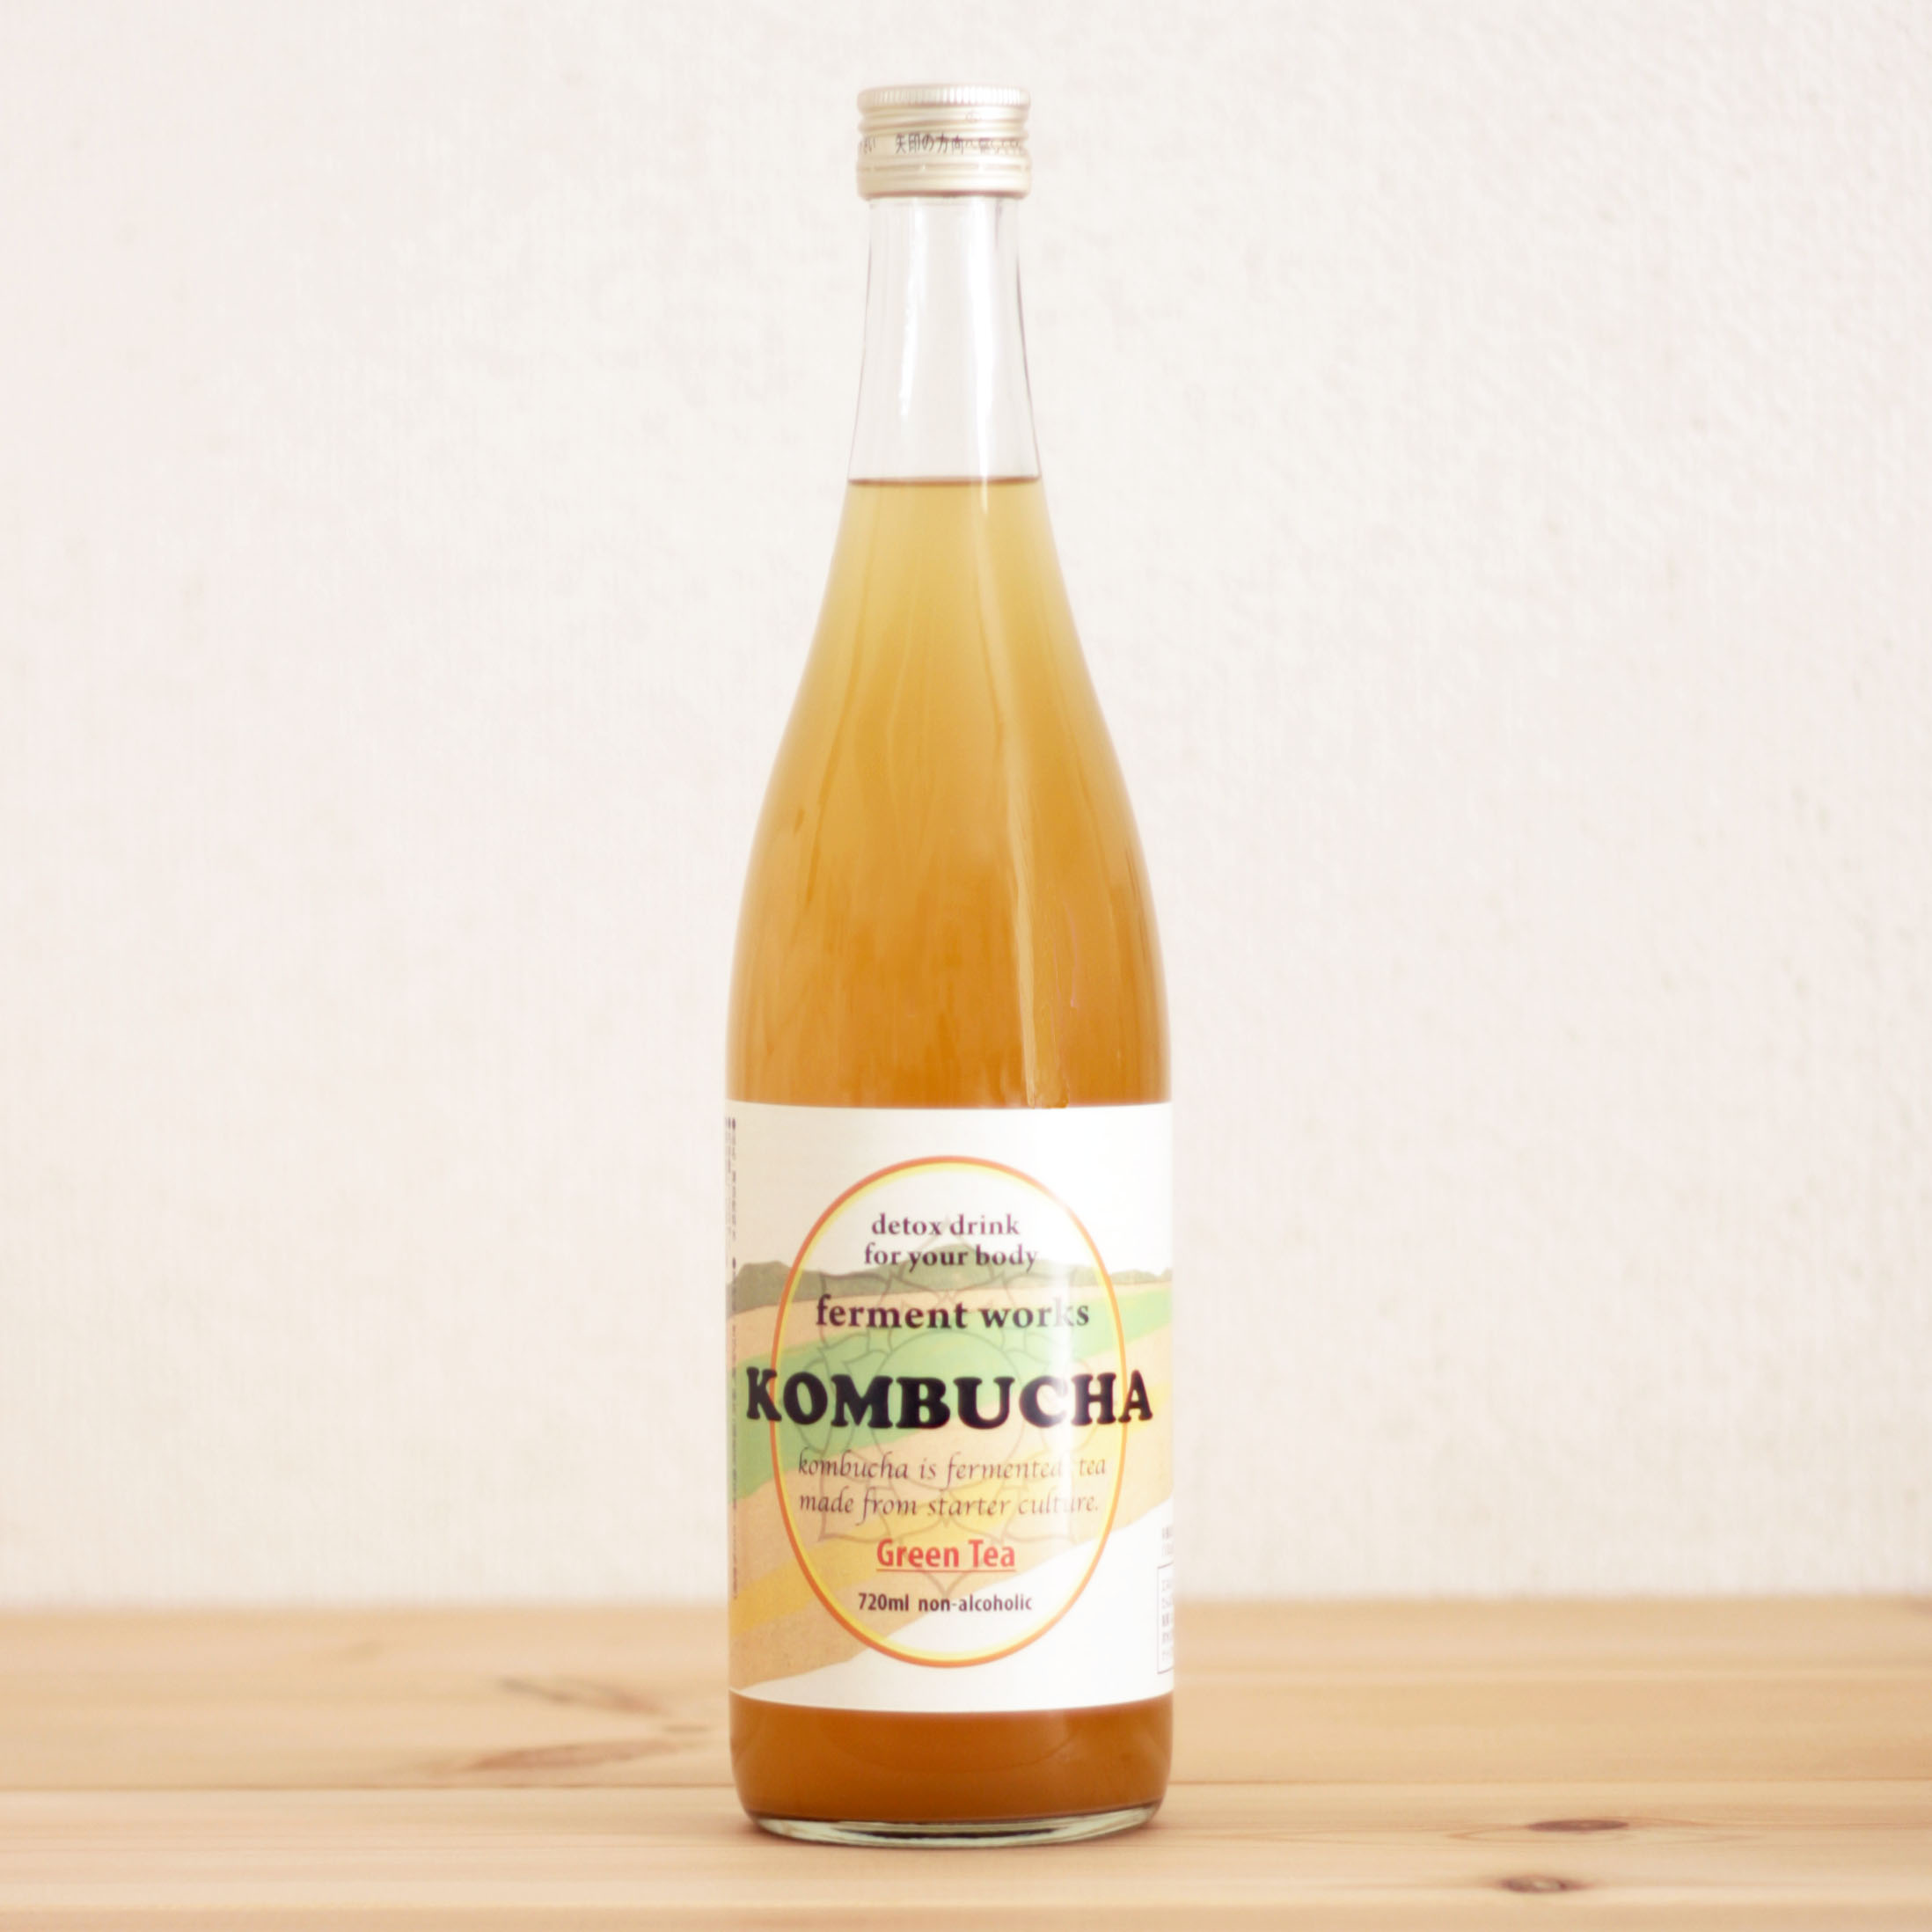 ferment works KOMBUCHA【コンブチャ】【紅茶キノコ】  グリーンティー720ml